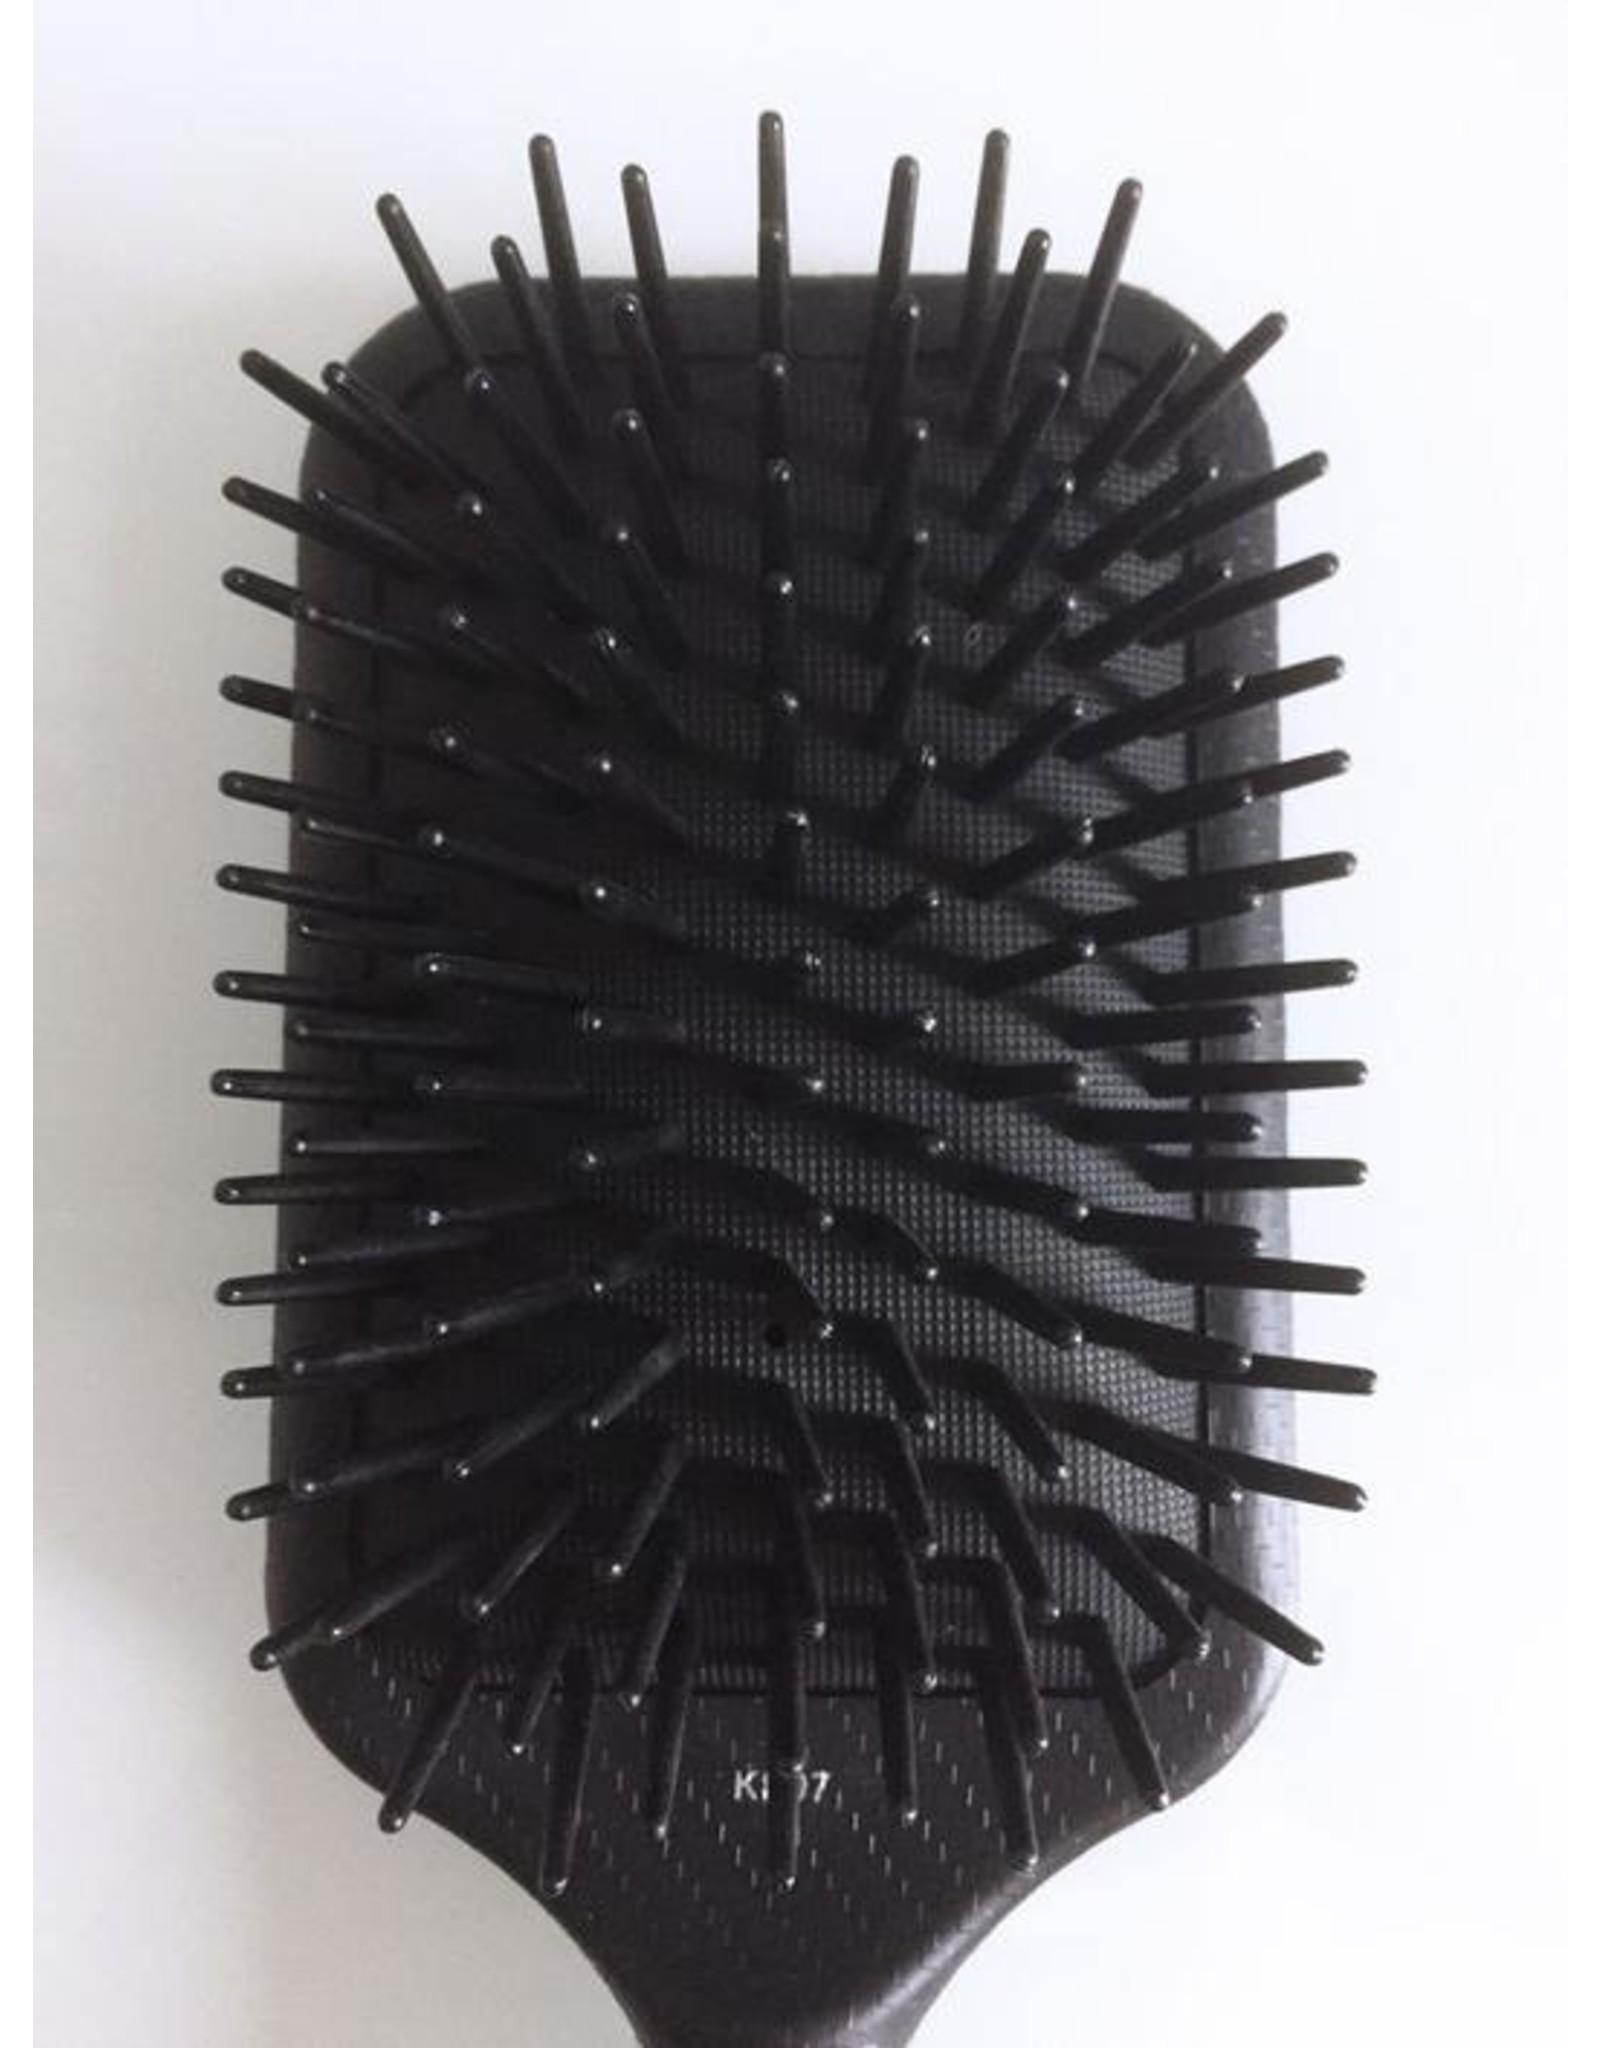 KENT.SALON The Finest Brushes-EST.1777 Kent.Salon KS 07 Paddelbürste groß